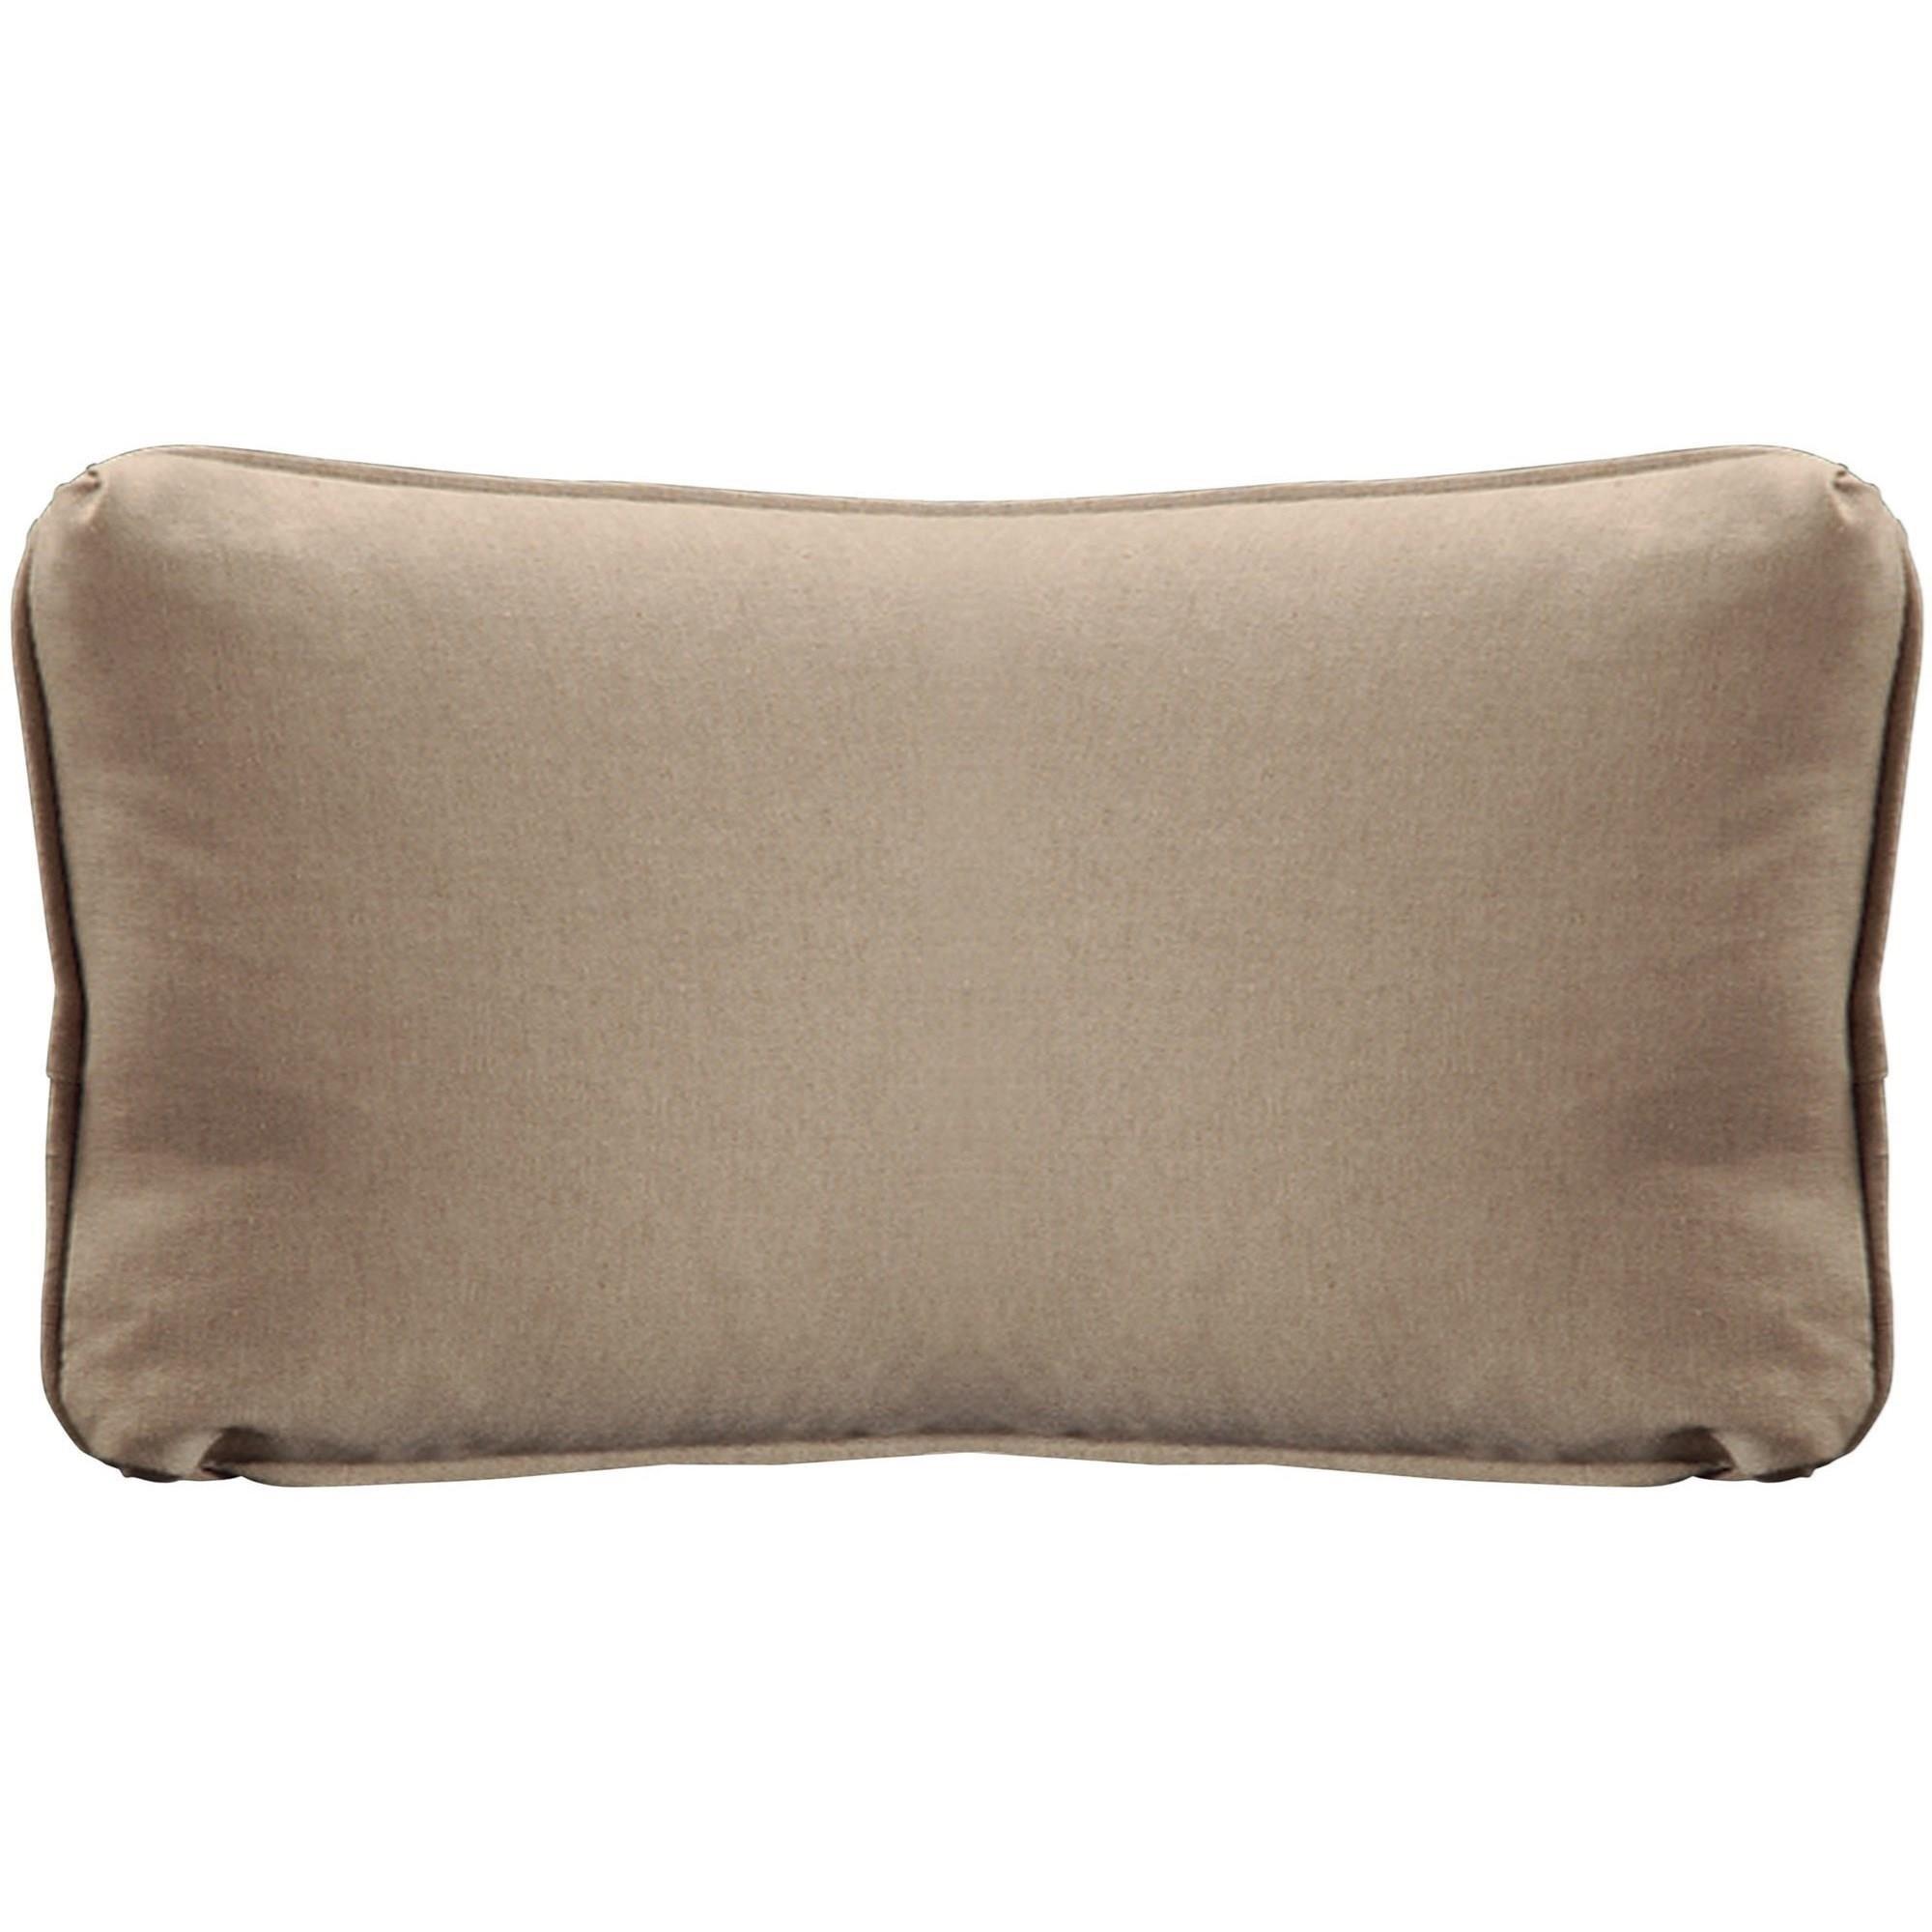 "Throw Pillows Knife Edge Kidney w/welt (12"" x 22"") at Williams & Kay"